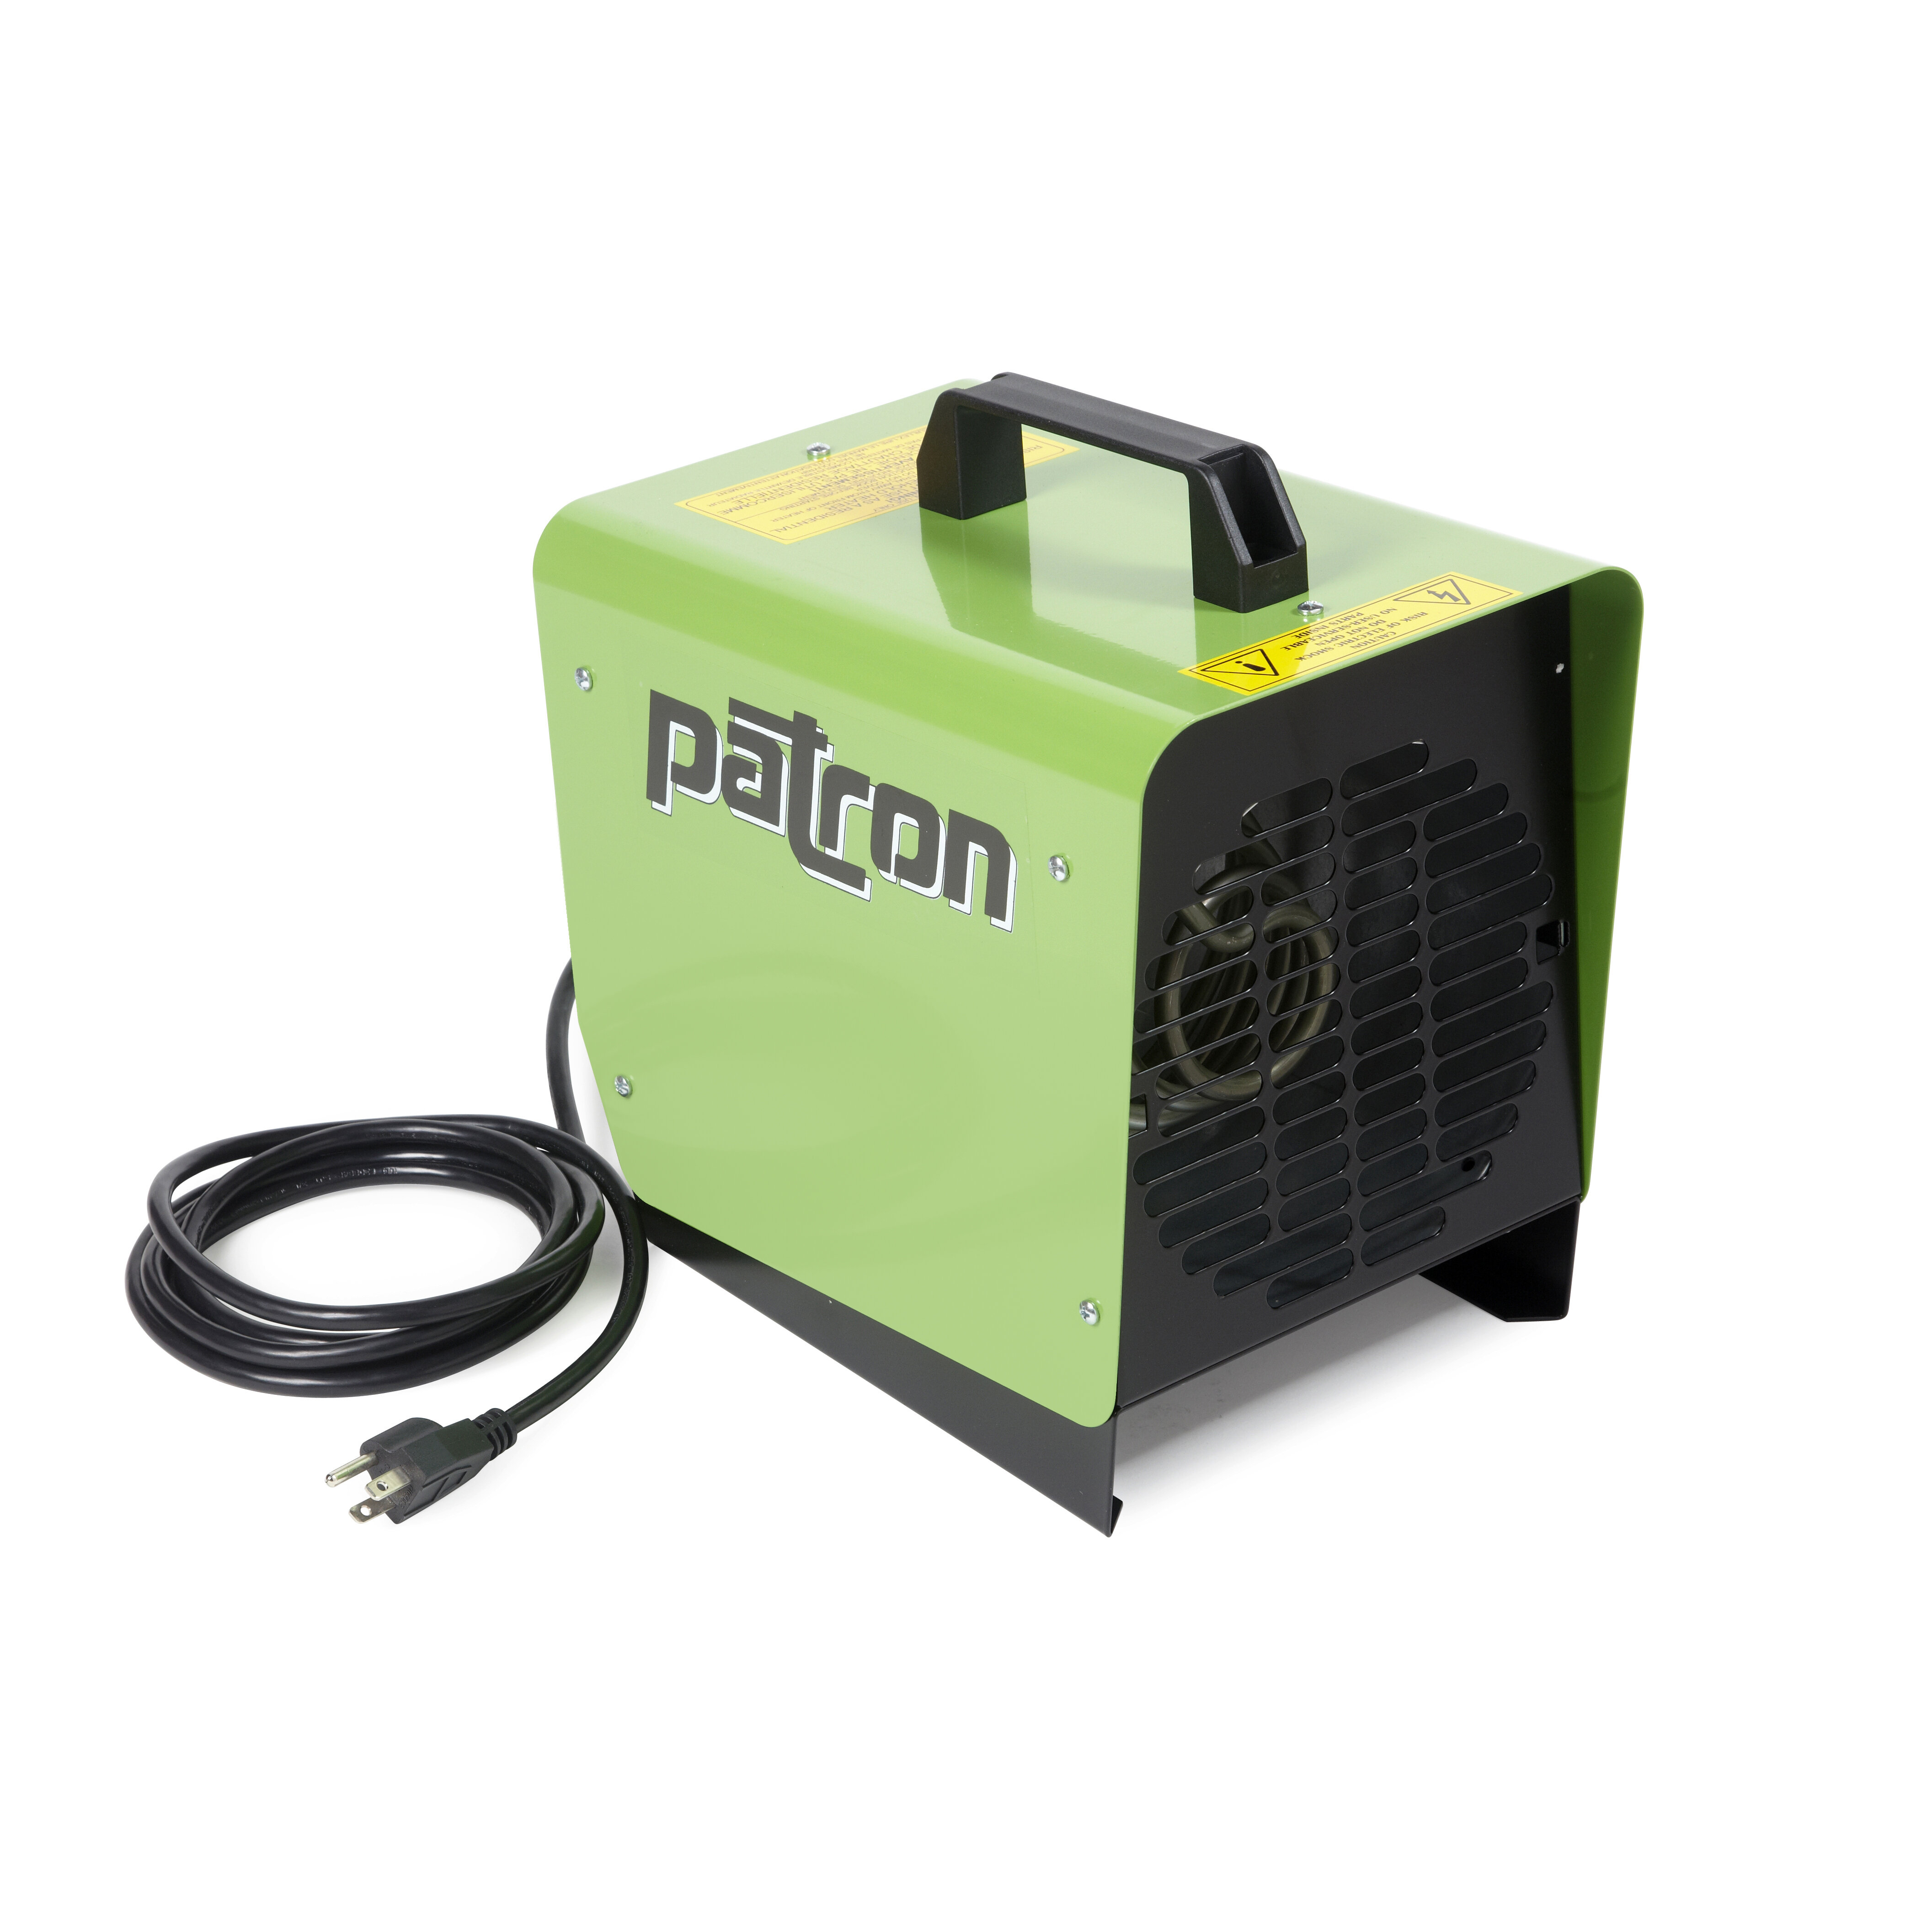 Patron E Series 1 500 Watt Portable Electric Fan Utility Heater Reviews Wayfair